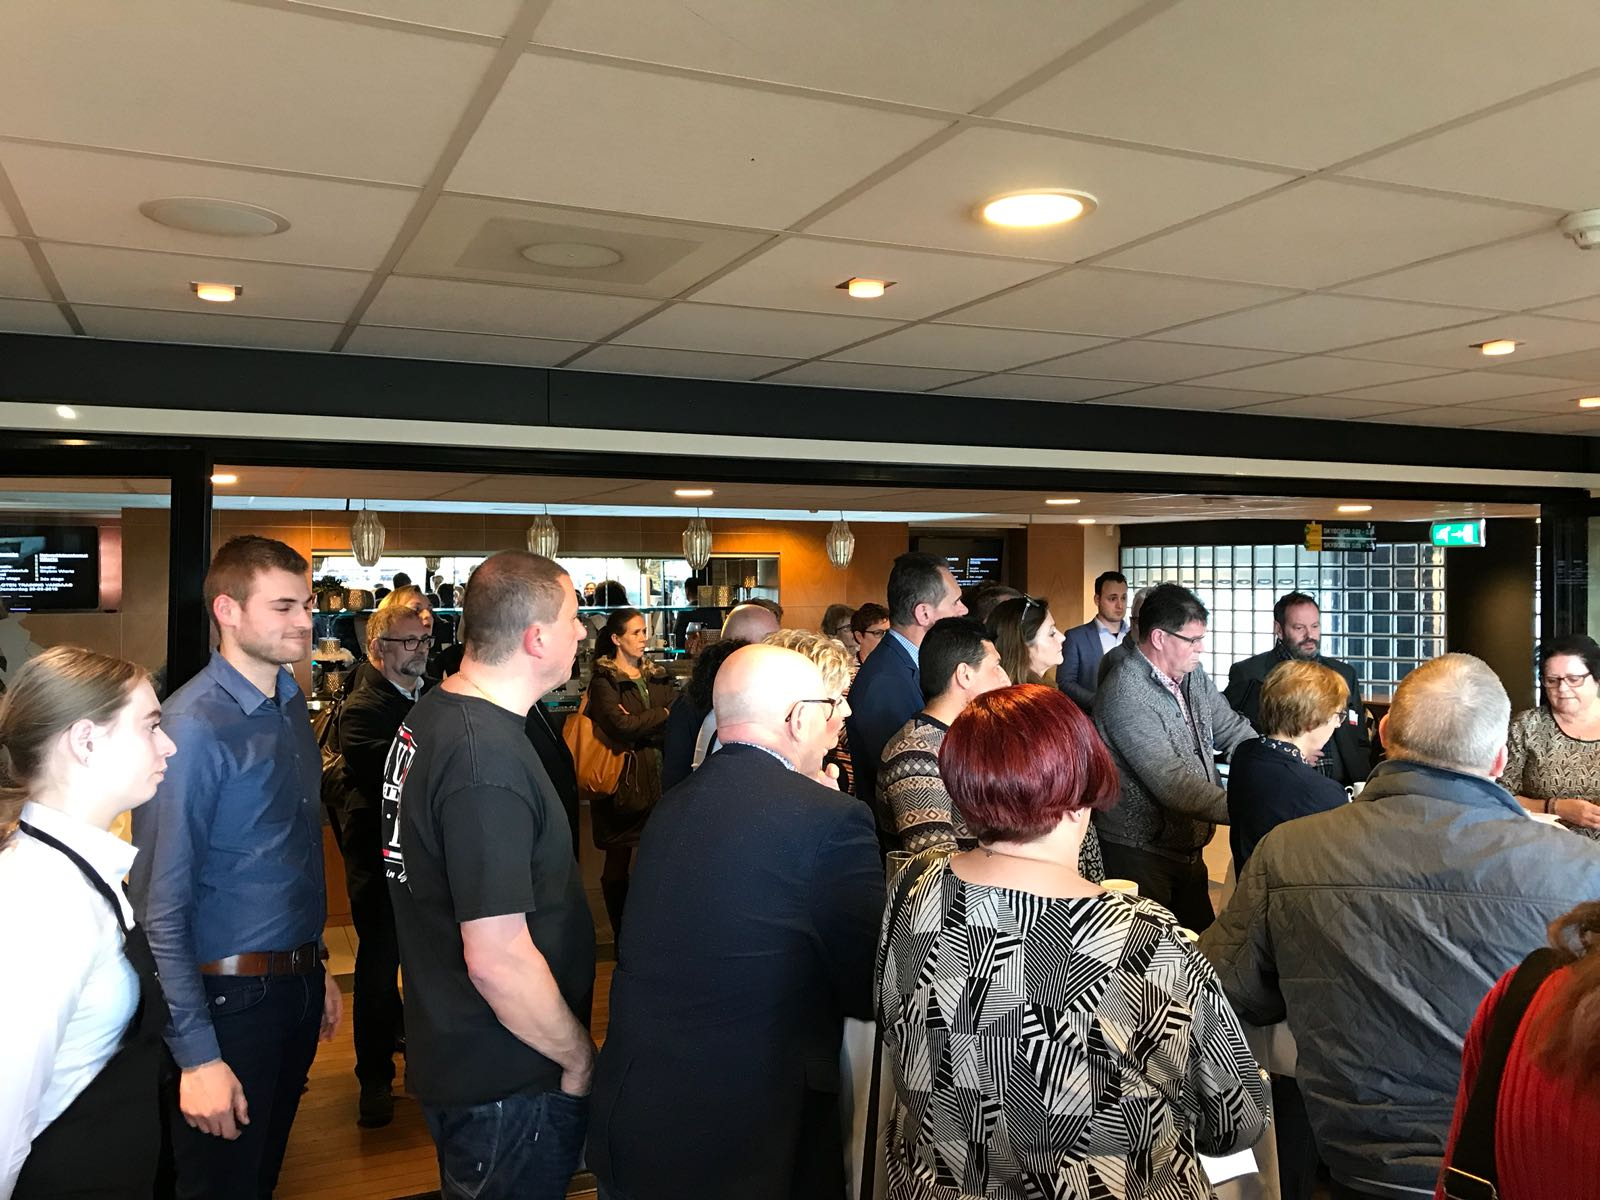 Succesvolle 50+ banenmarkt in het Parkstad Limburg Stadion